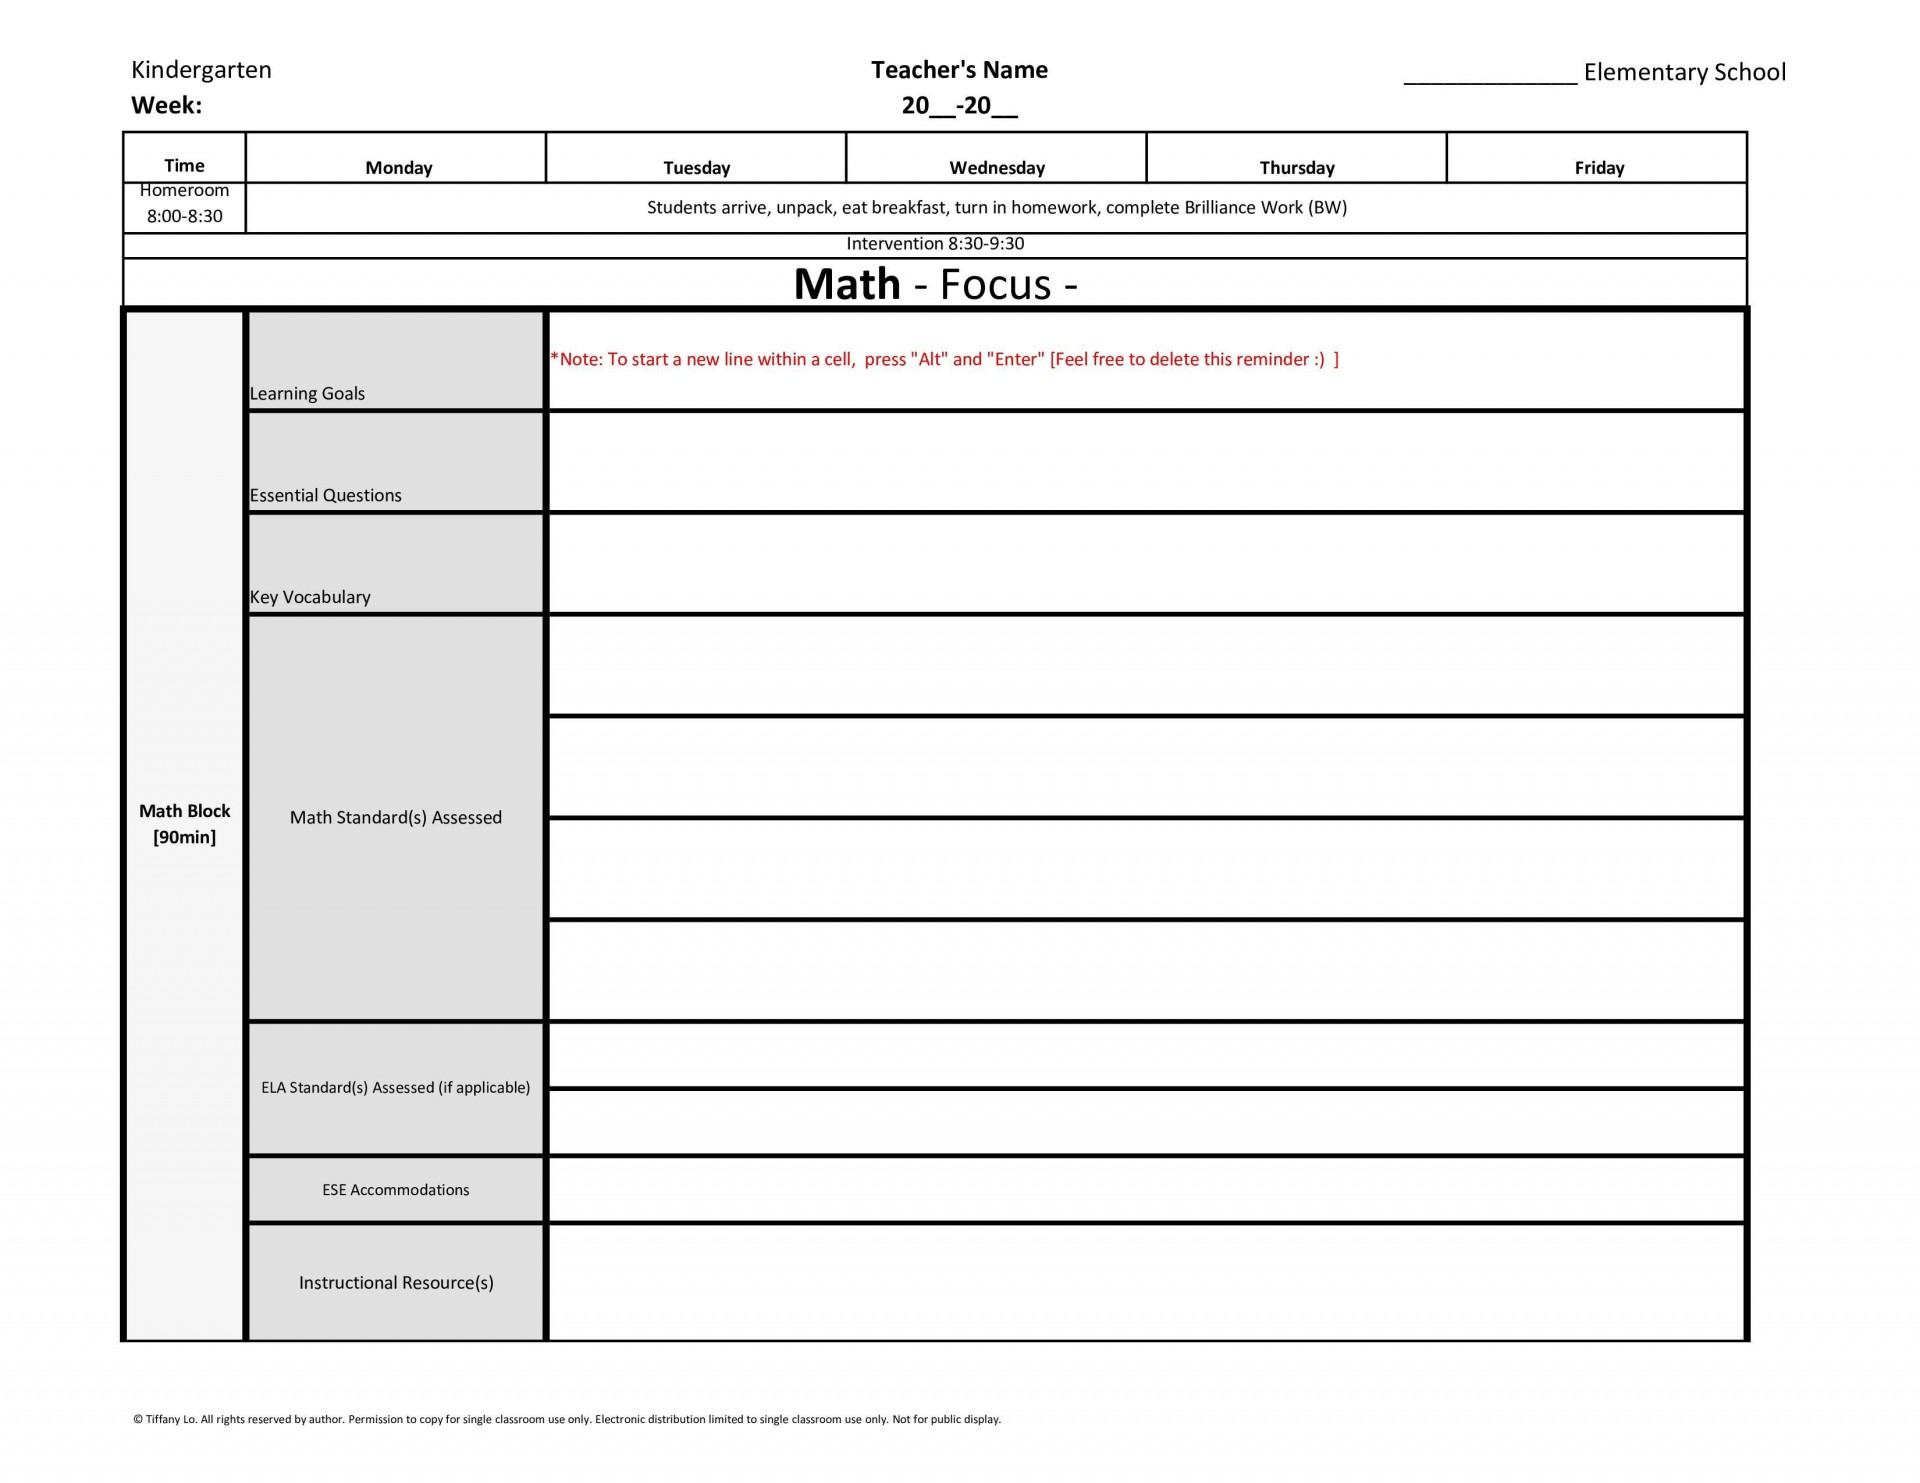 003 Astounding Lesson Plan Template Free Highest Clarity  Weekly Printable Editable Preschool Format1920